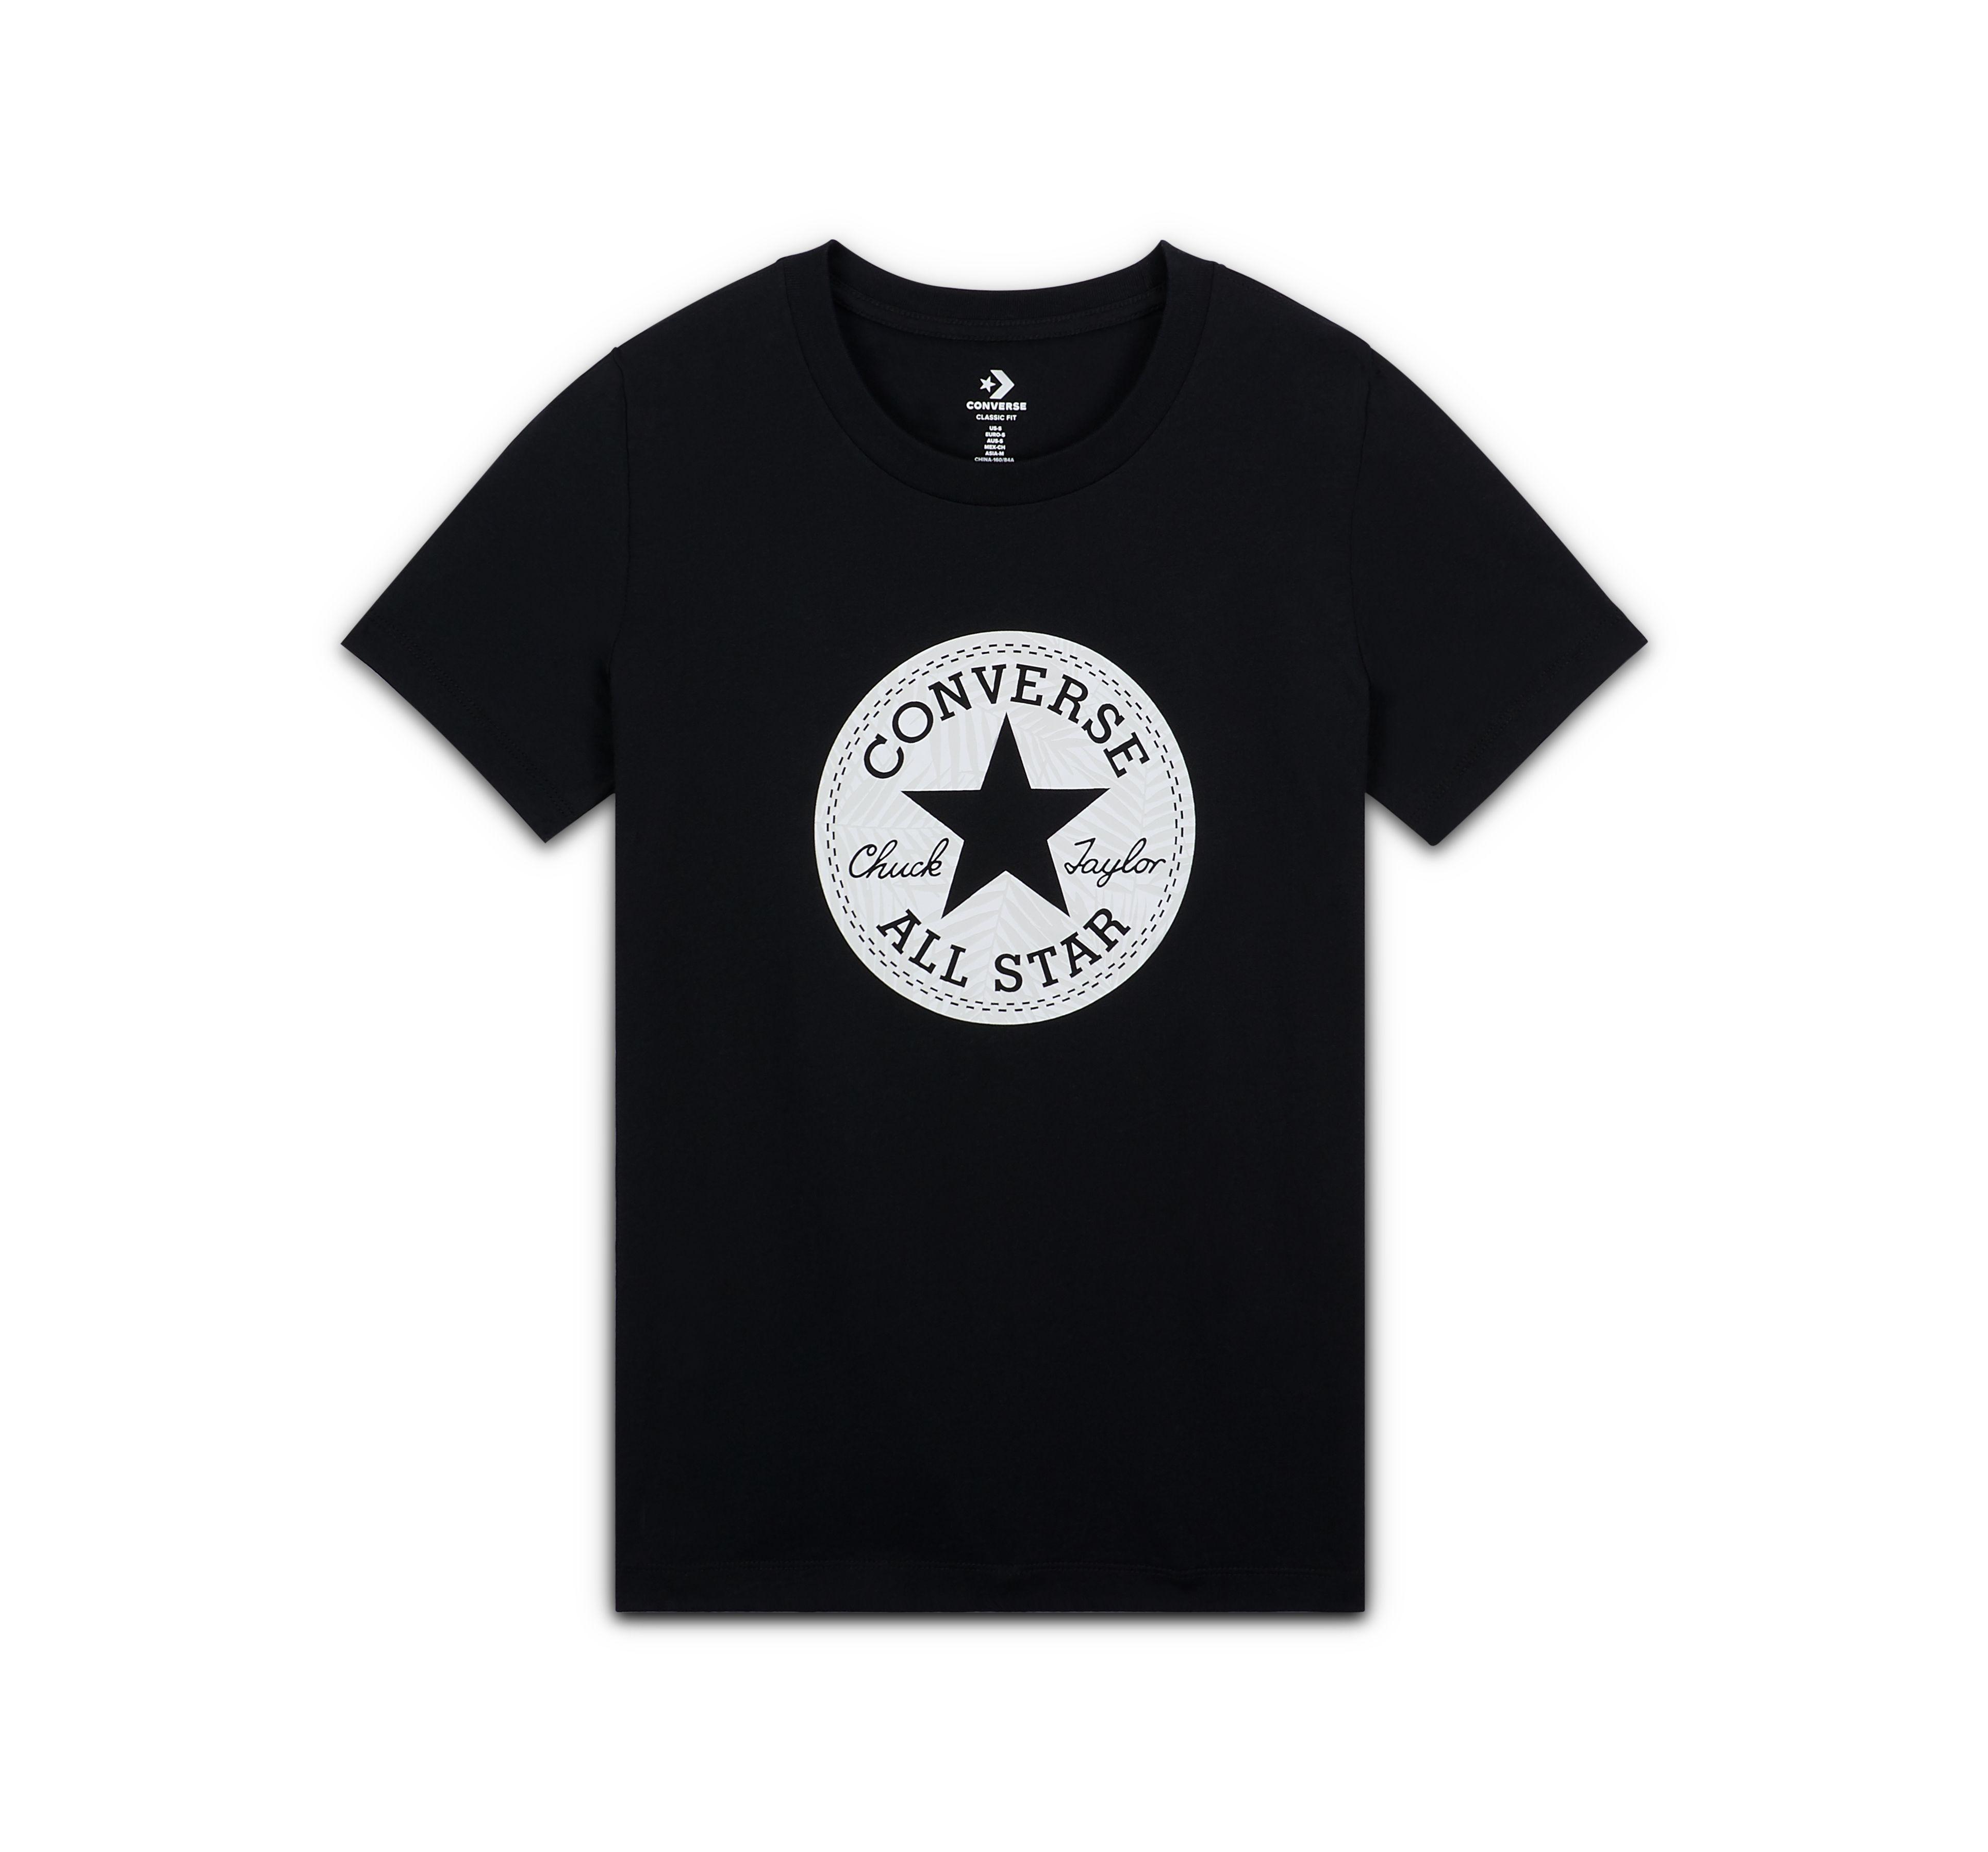 converse chuck taylor patch t shirt